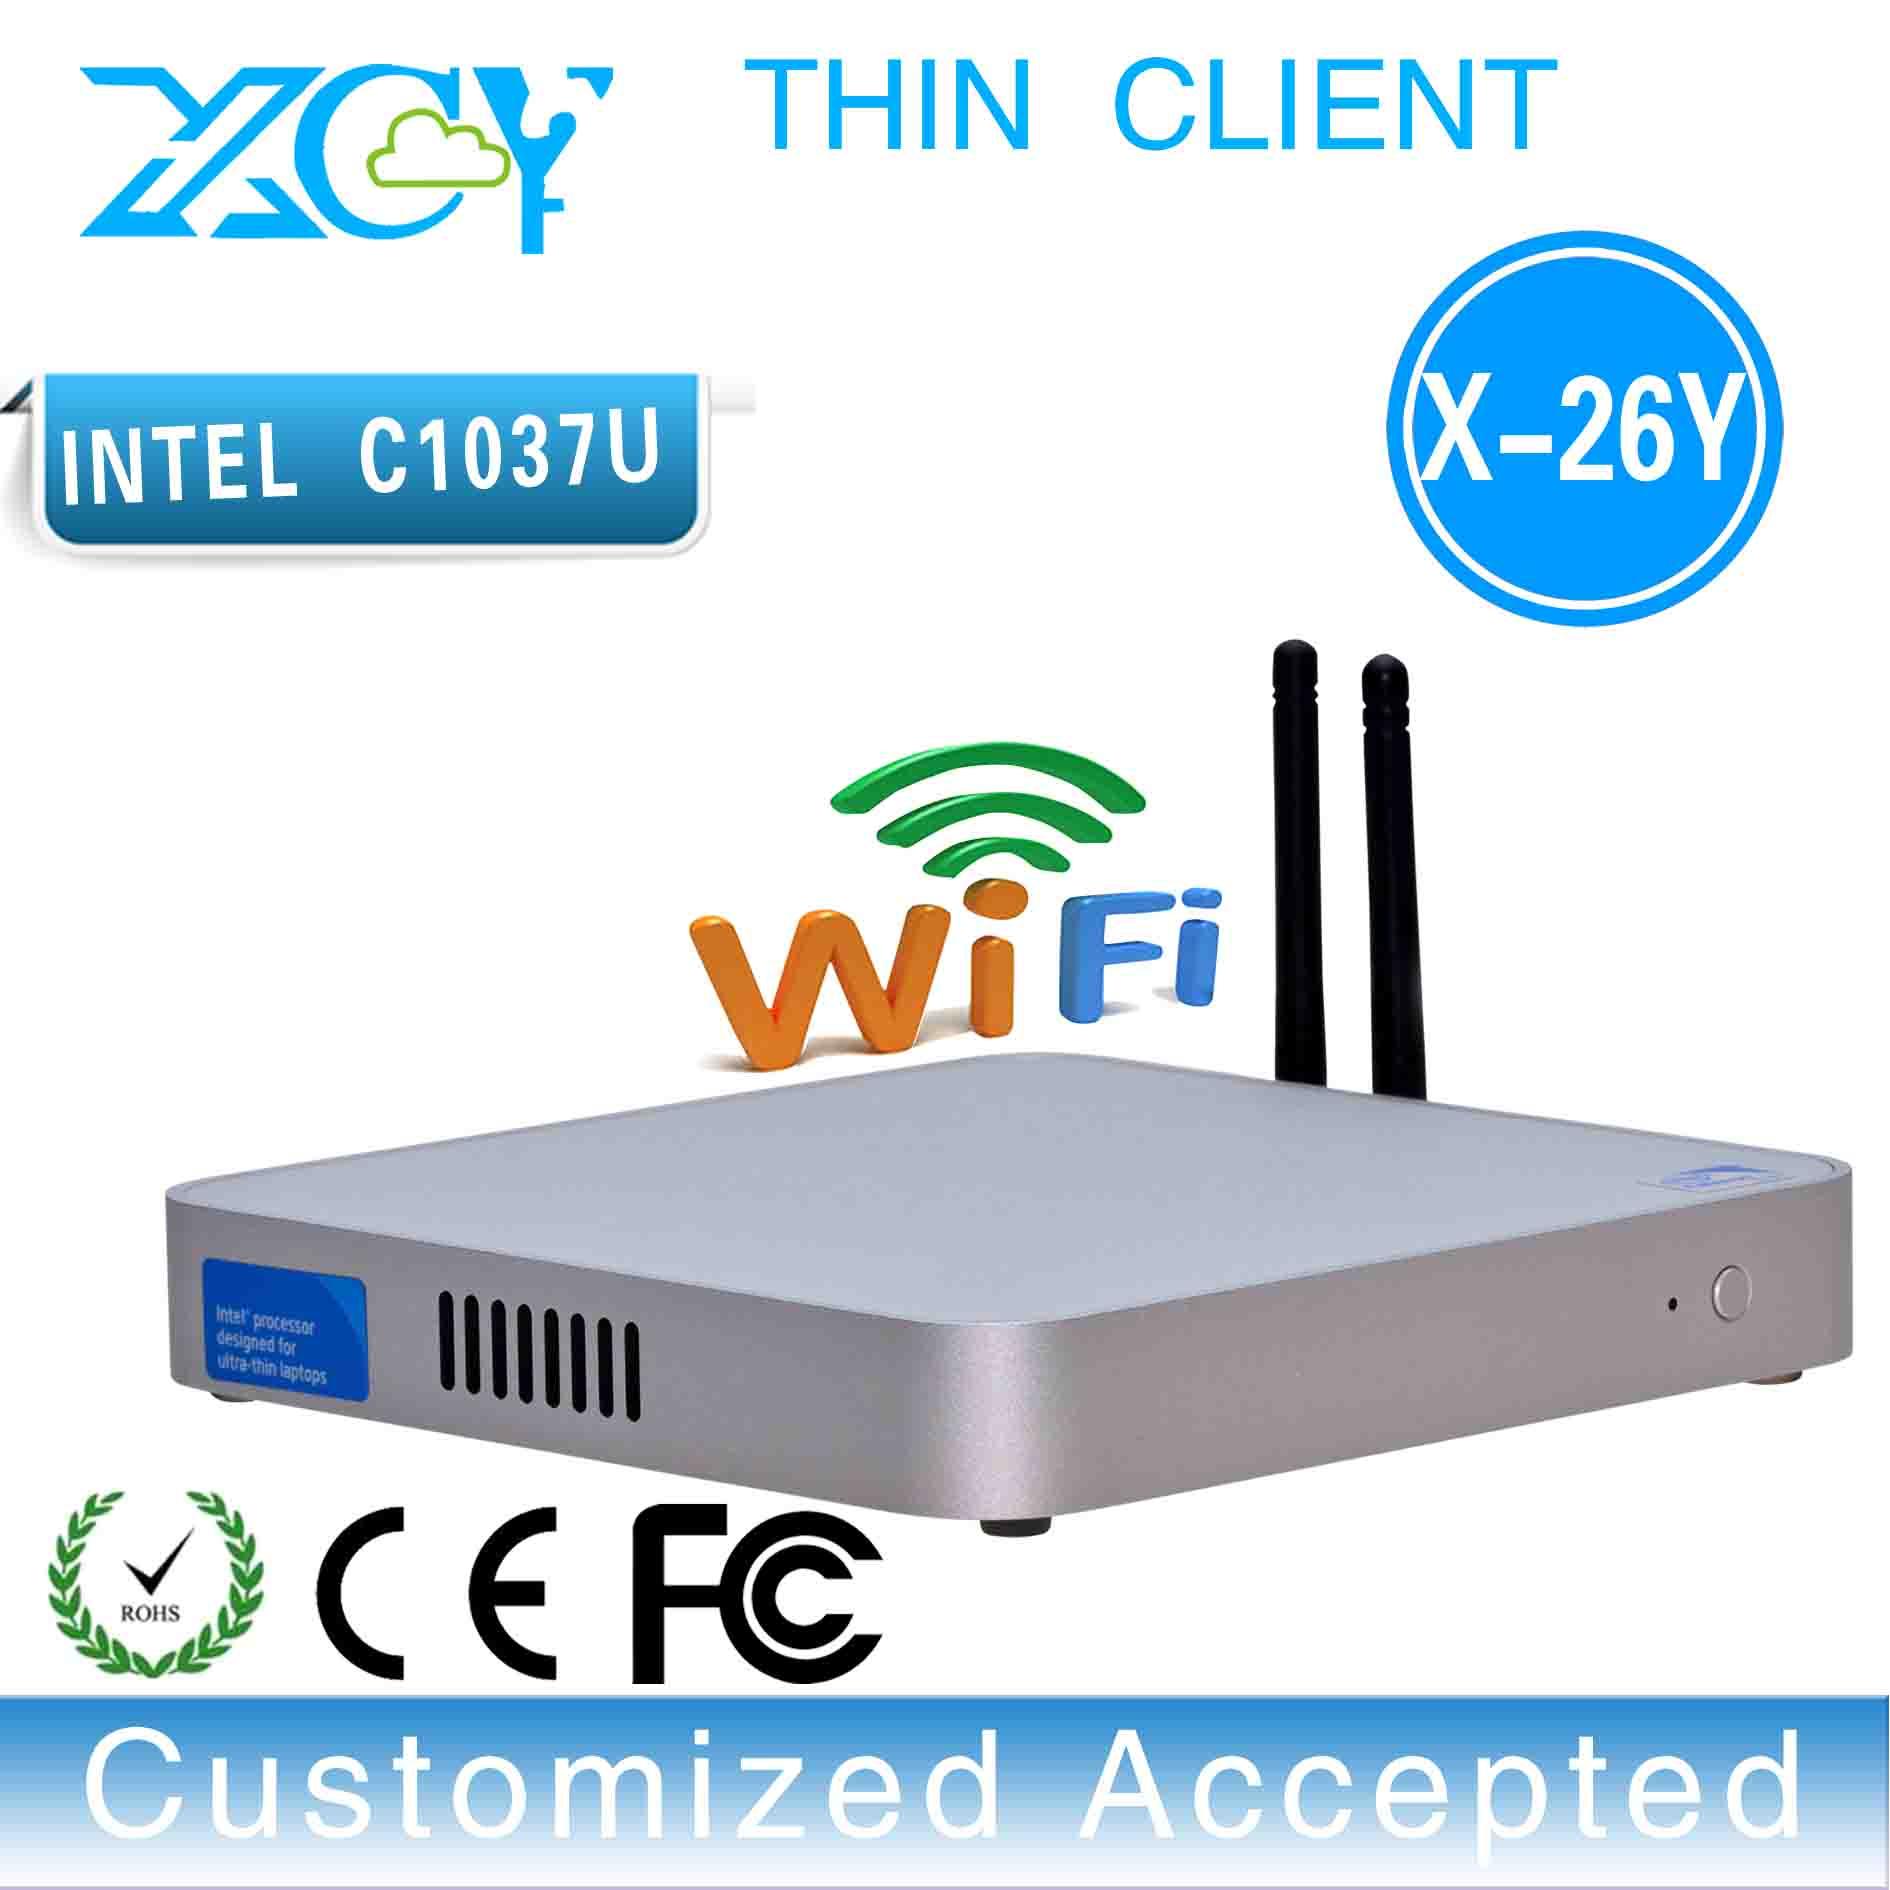 XCY Fanless Industrial Mini PC Intel Celeron C1037U DDR3 Embedded Desktop Computer OS Box PC Mini Server Thin client Terminal(China (Mainland))